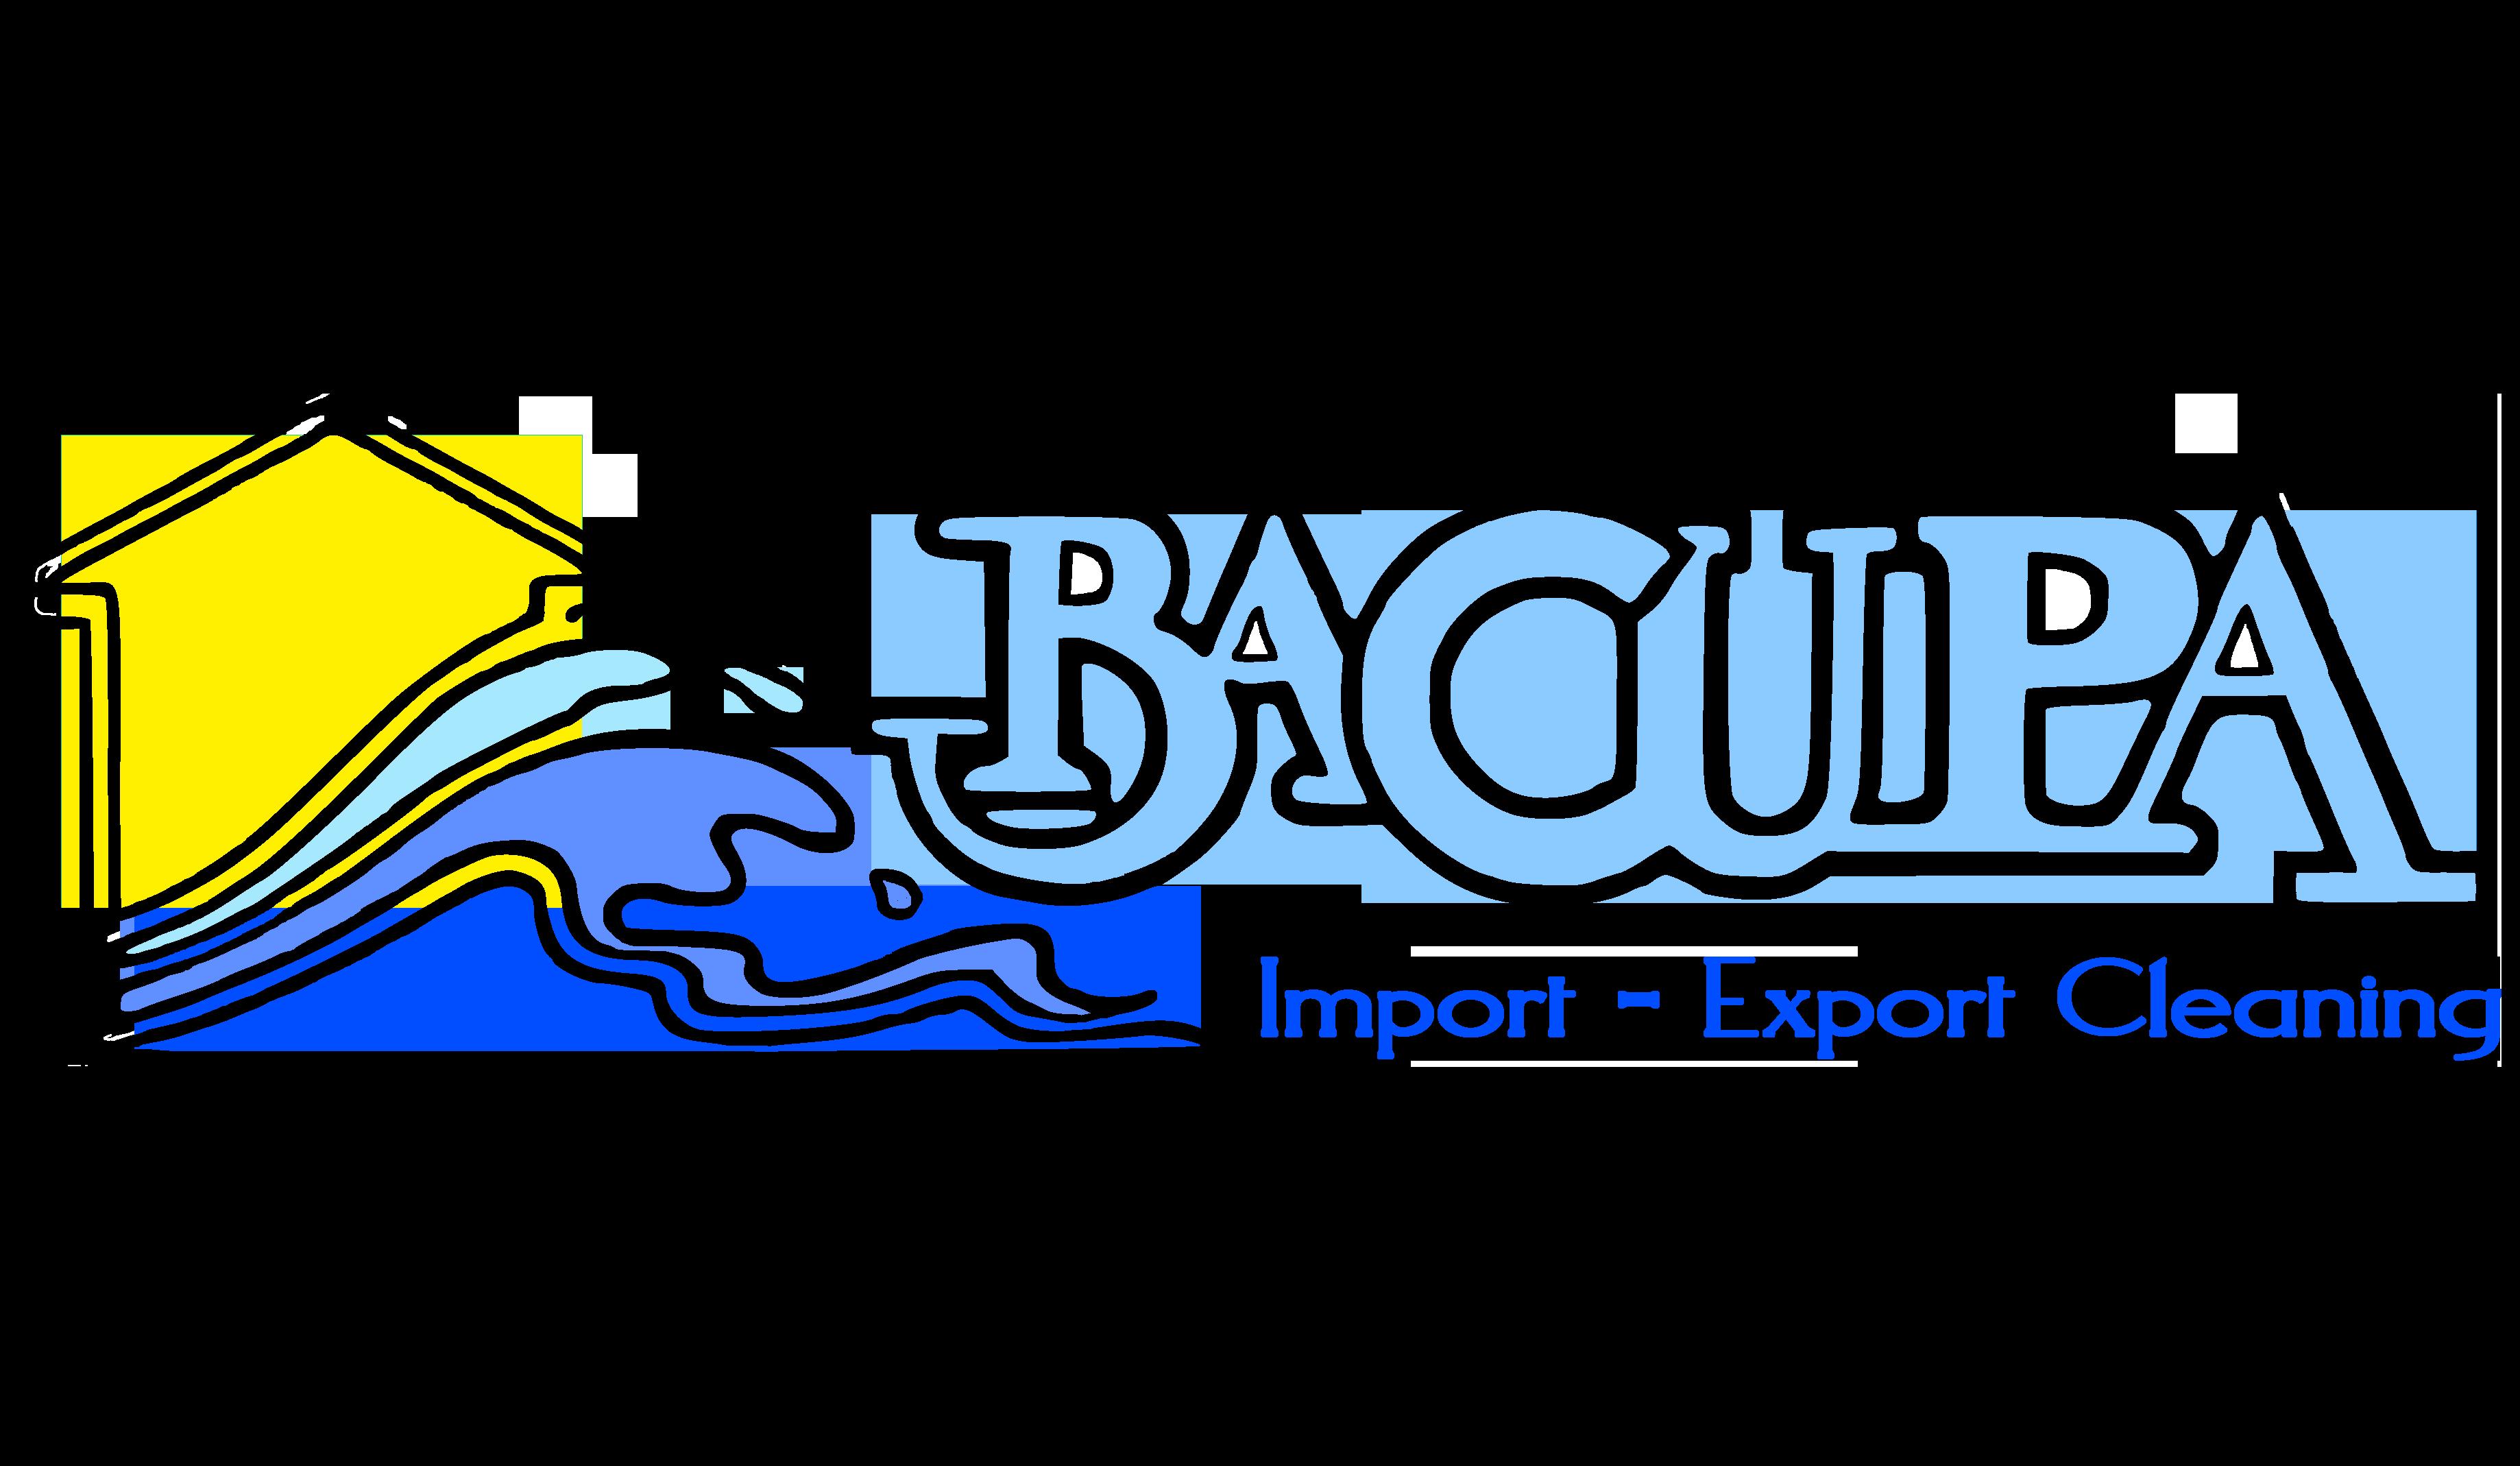 Bacupa